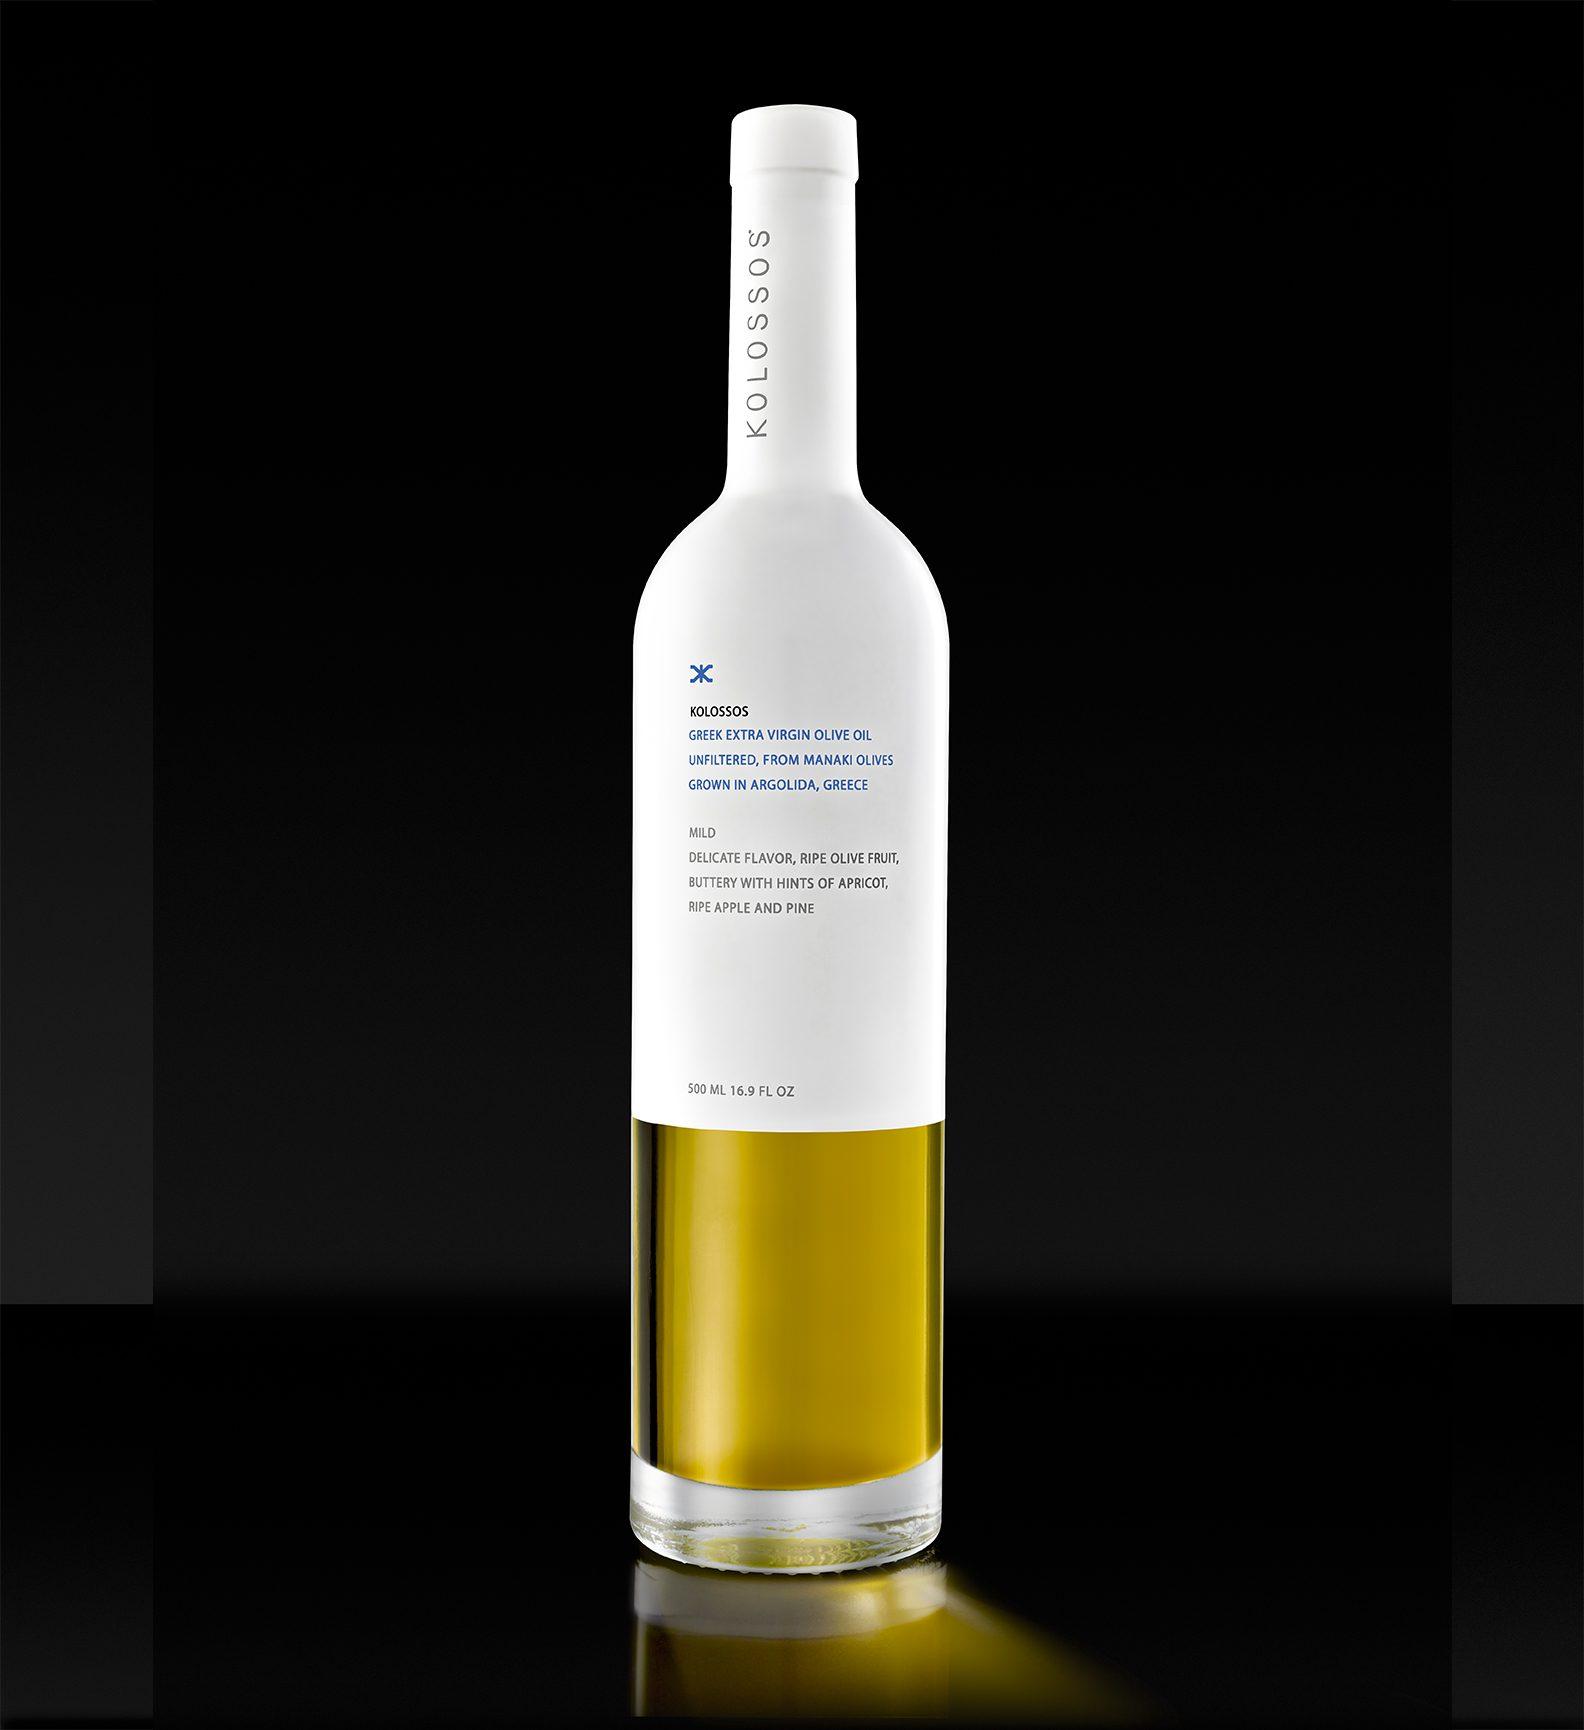 Kolossos Mild Greek olive oil food entertaining in the pursuit